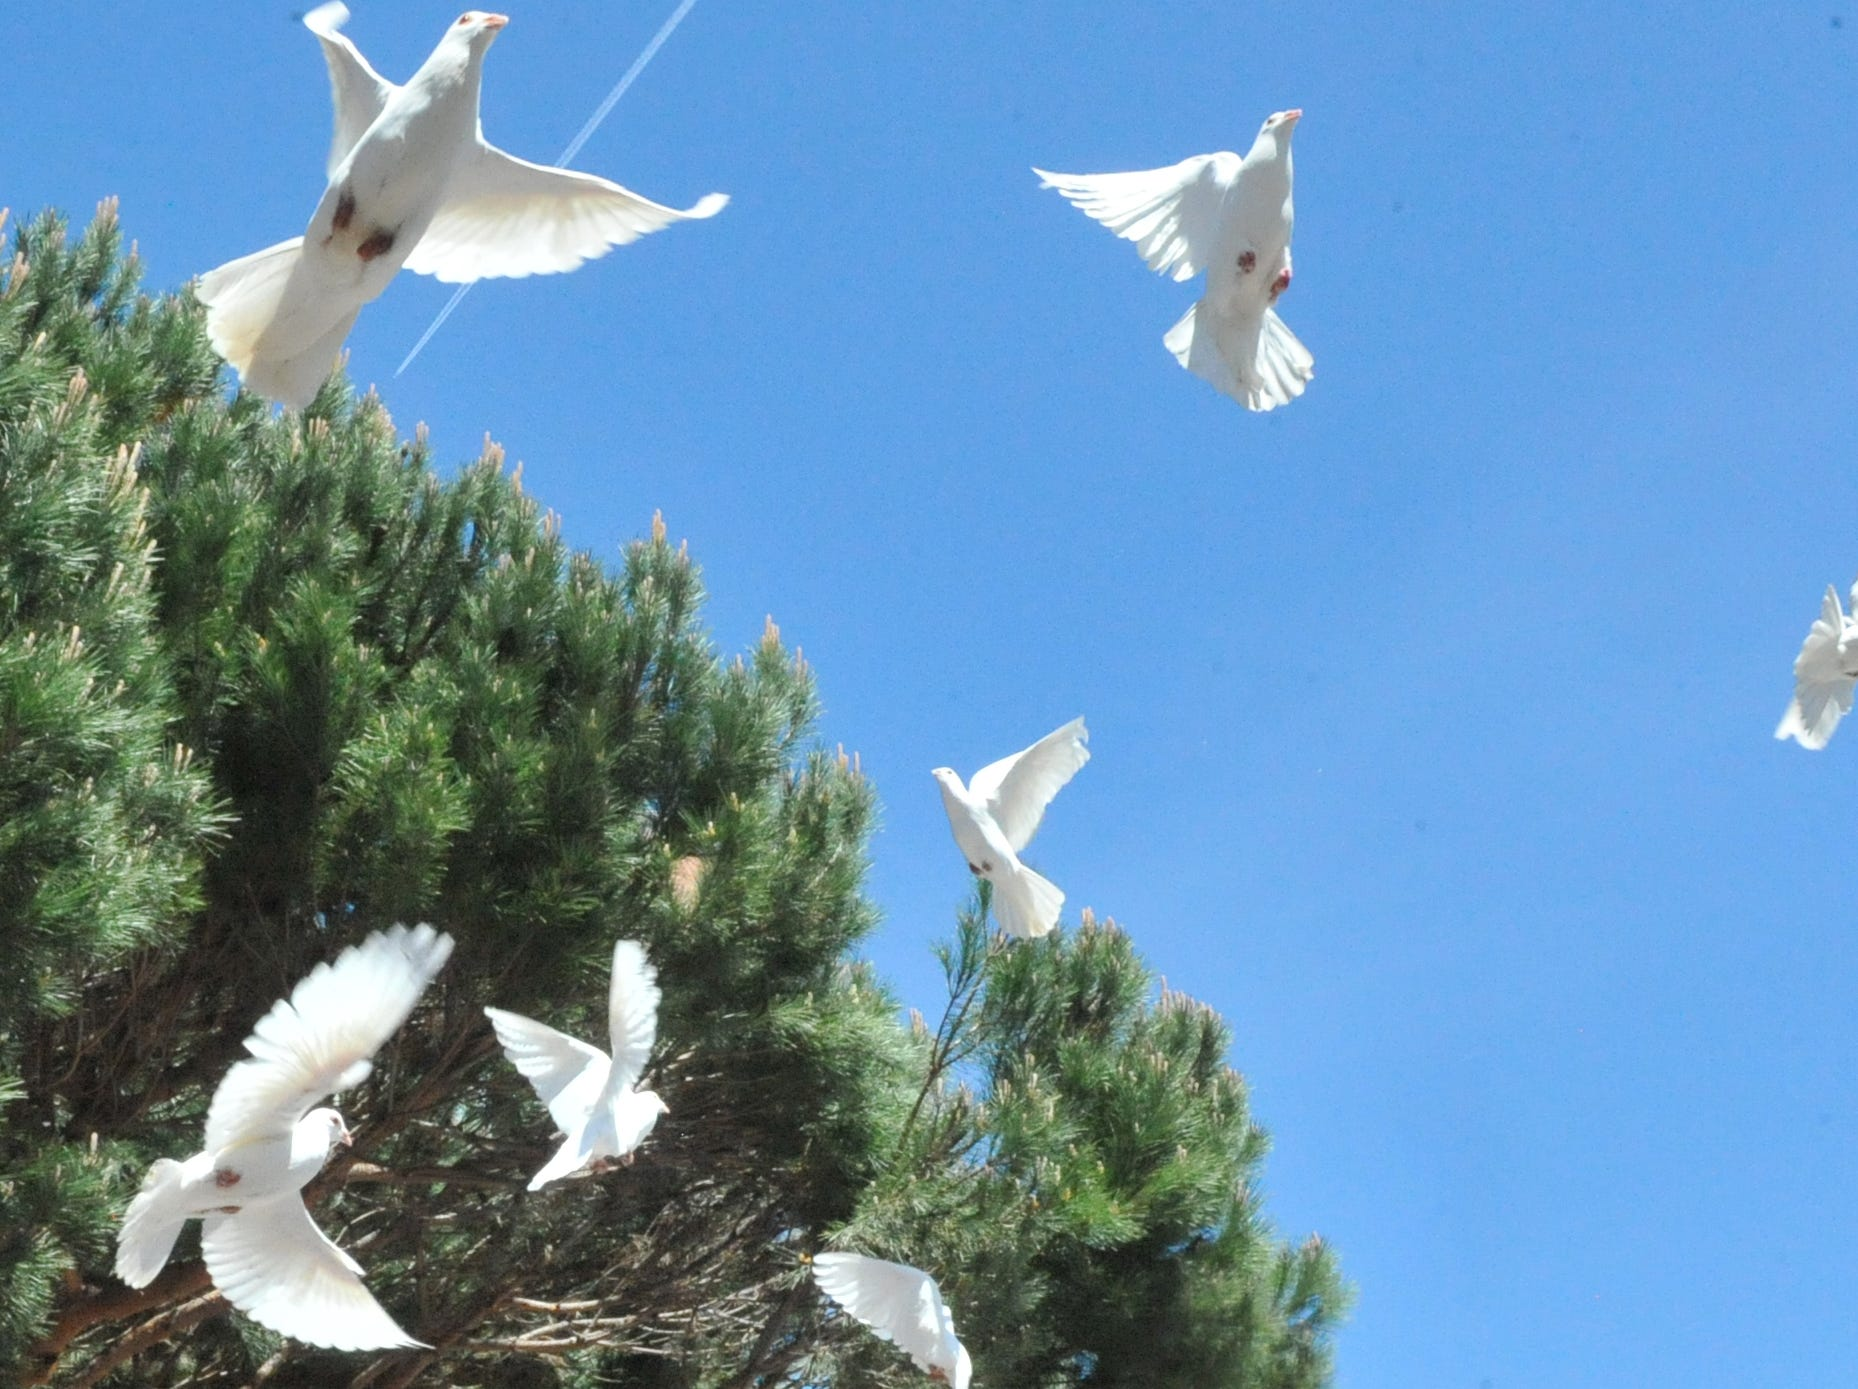 The doves take flight. April 12, 2019.